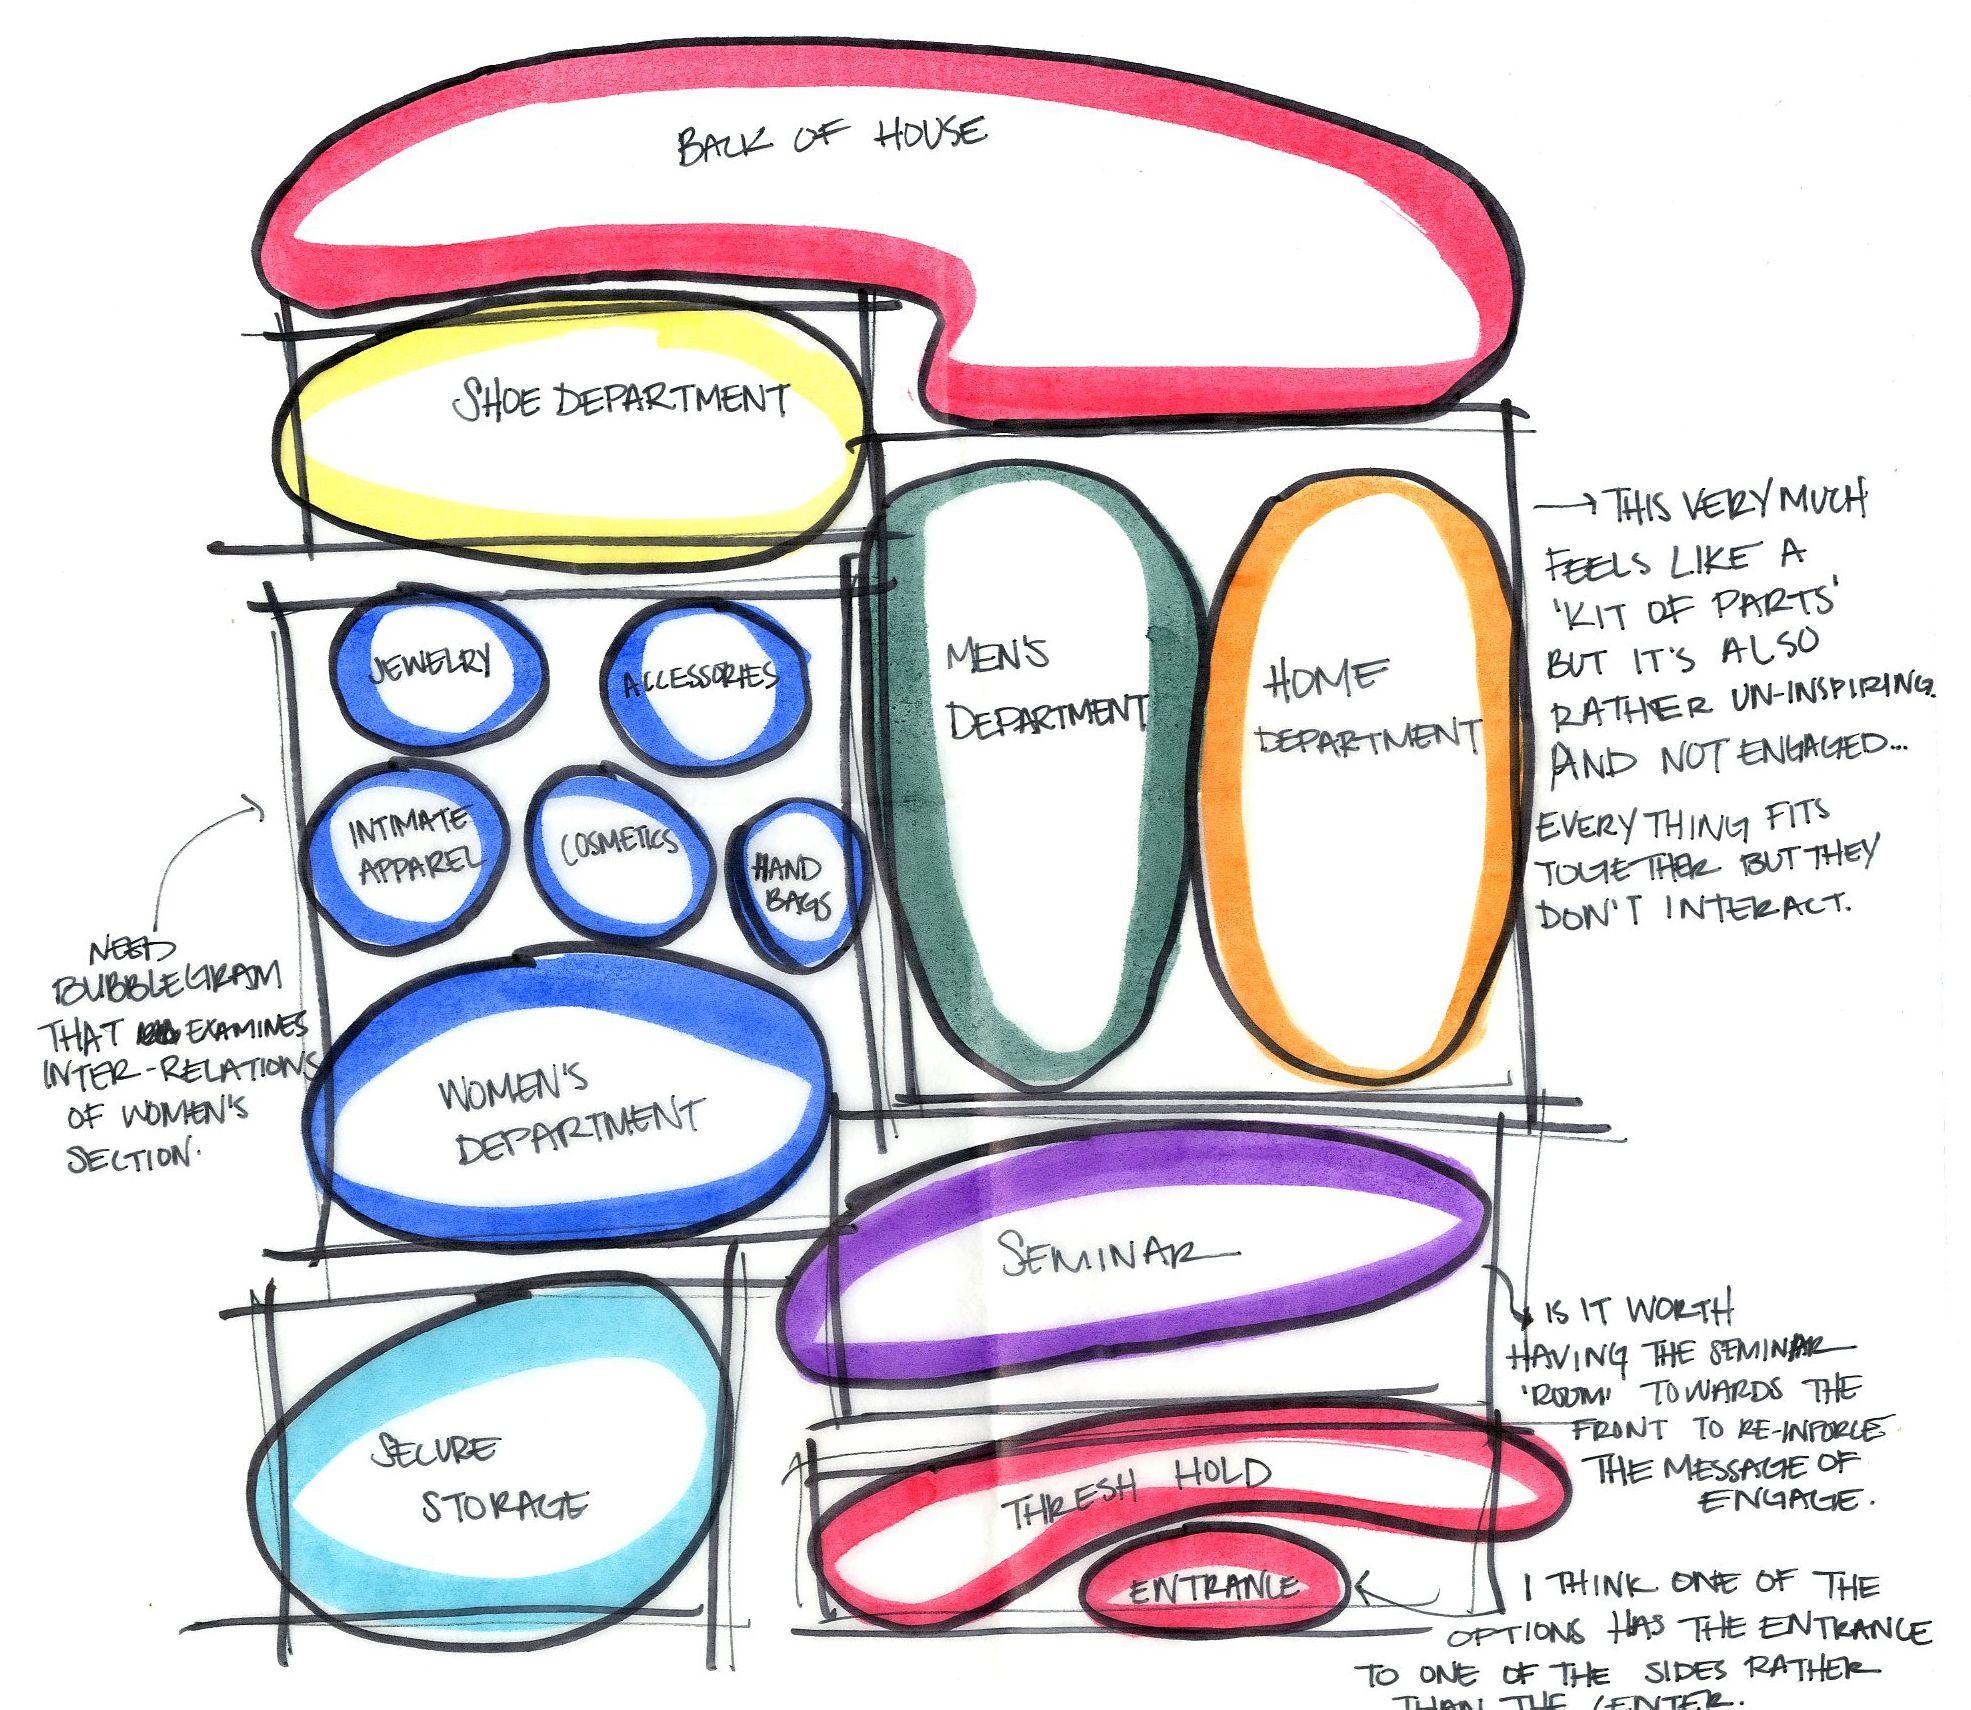 Pin By Saper Azrul On Bubbles Pinterest Diagram Bubble Block In Architecture Function Program Design